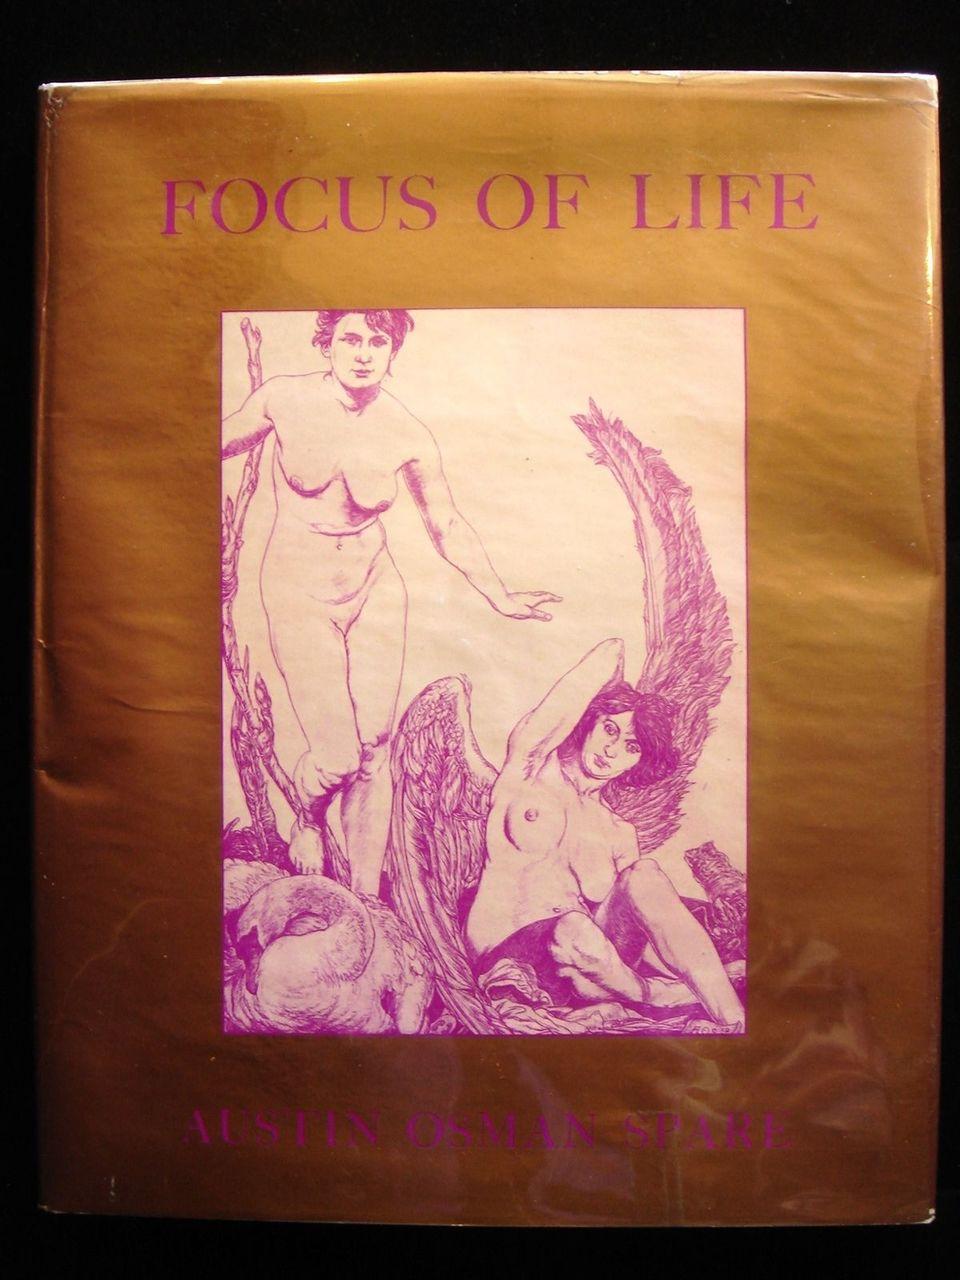 FOCUS ON LIFE Austin Osman Spare 1975 Occult Chaos Magic Eros Art DJ Limited Ed